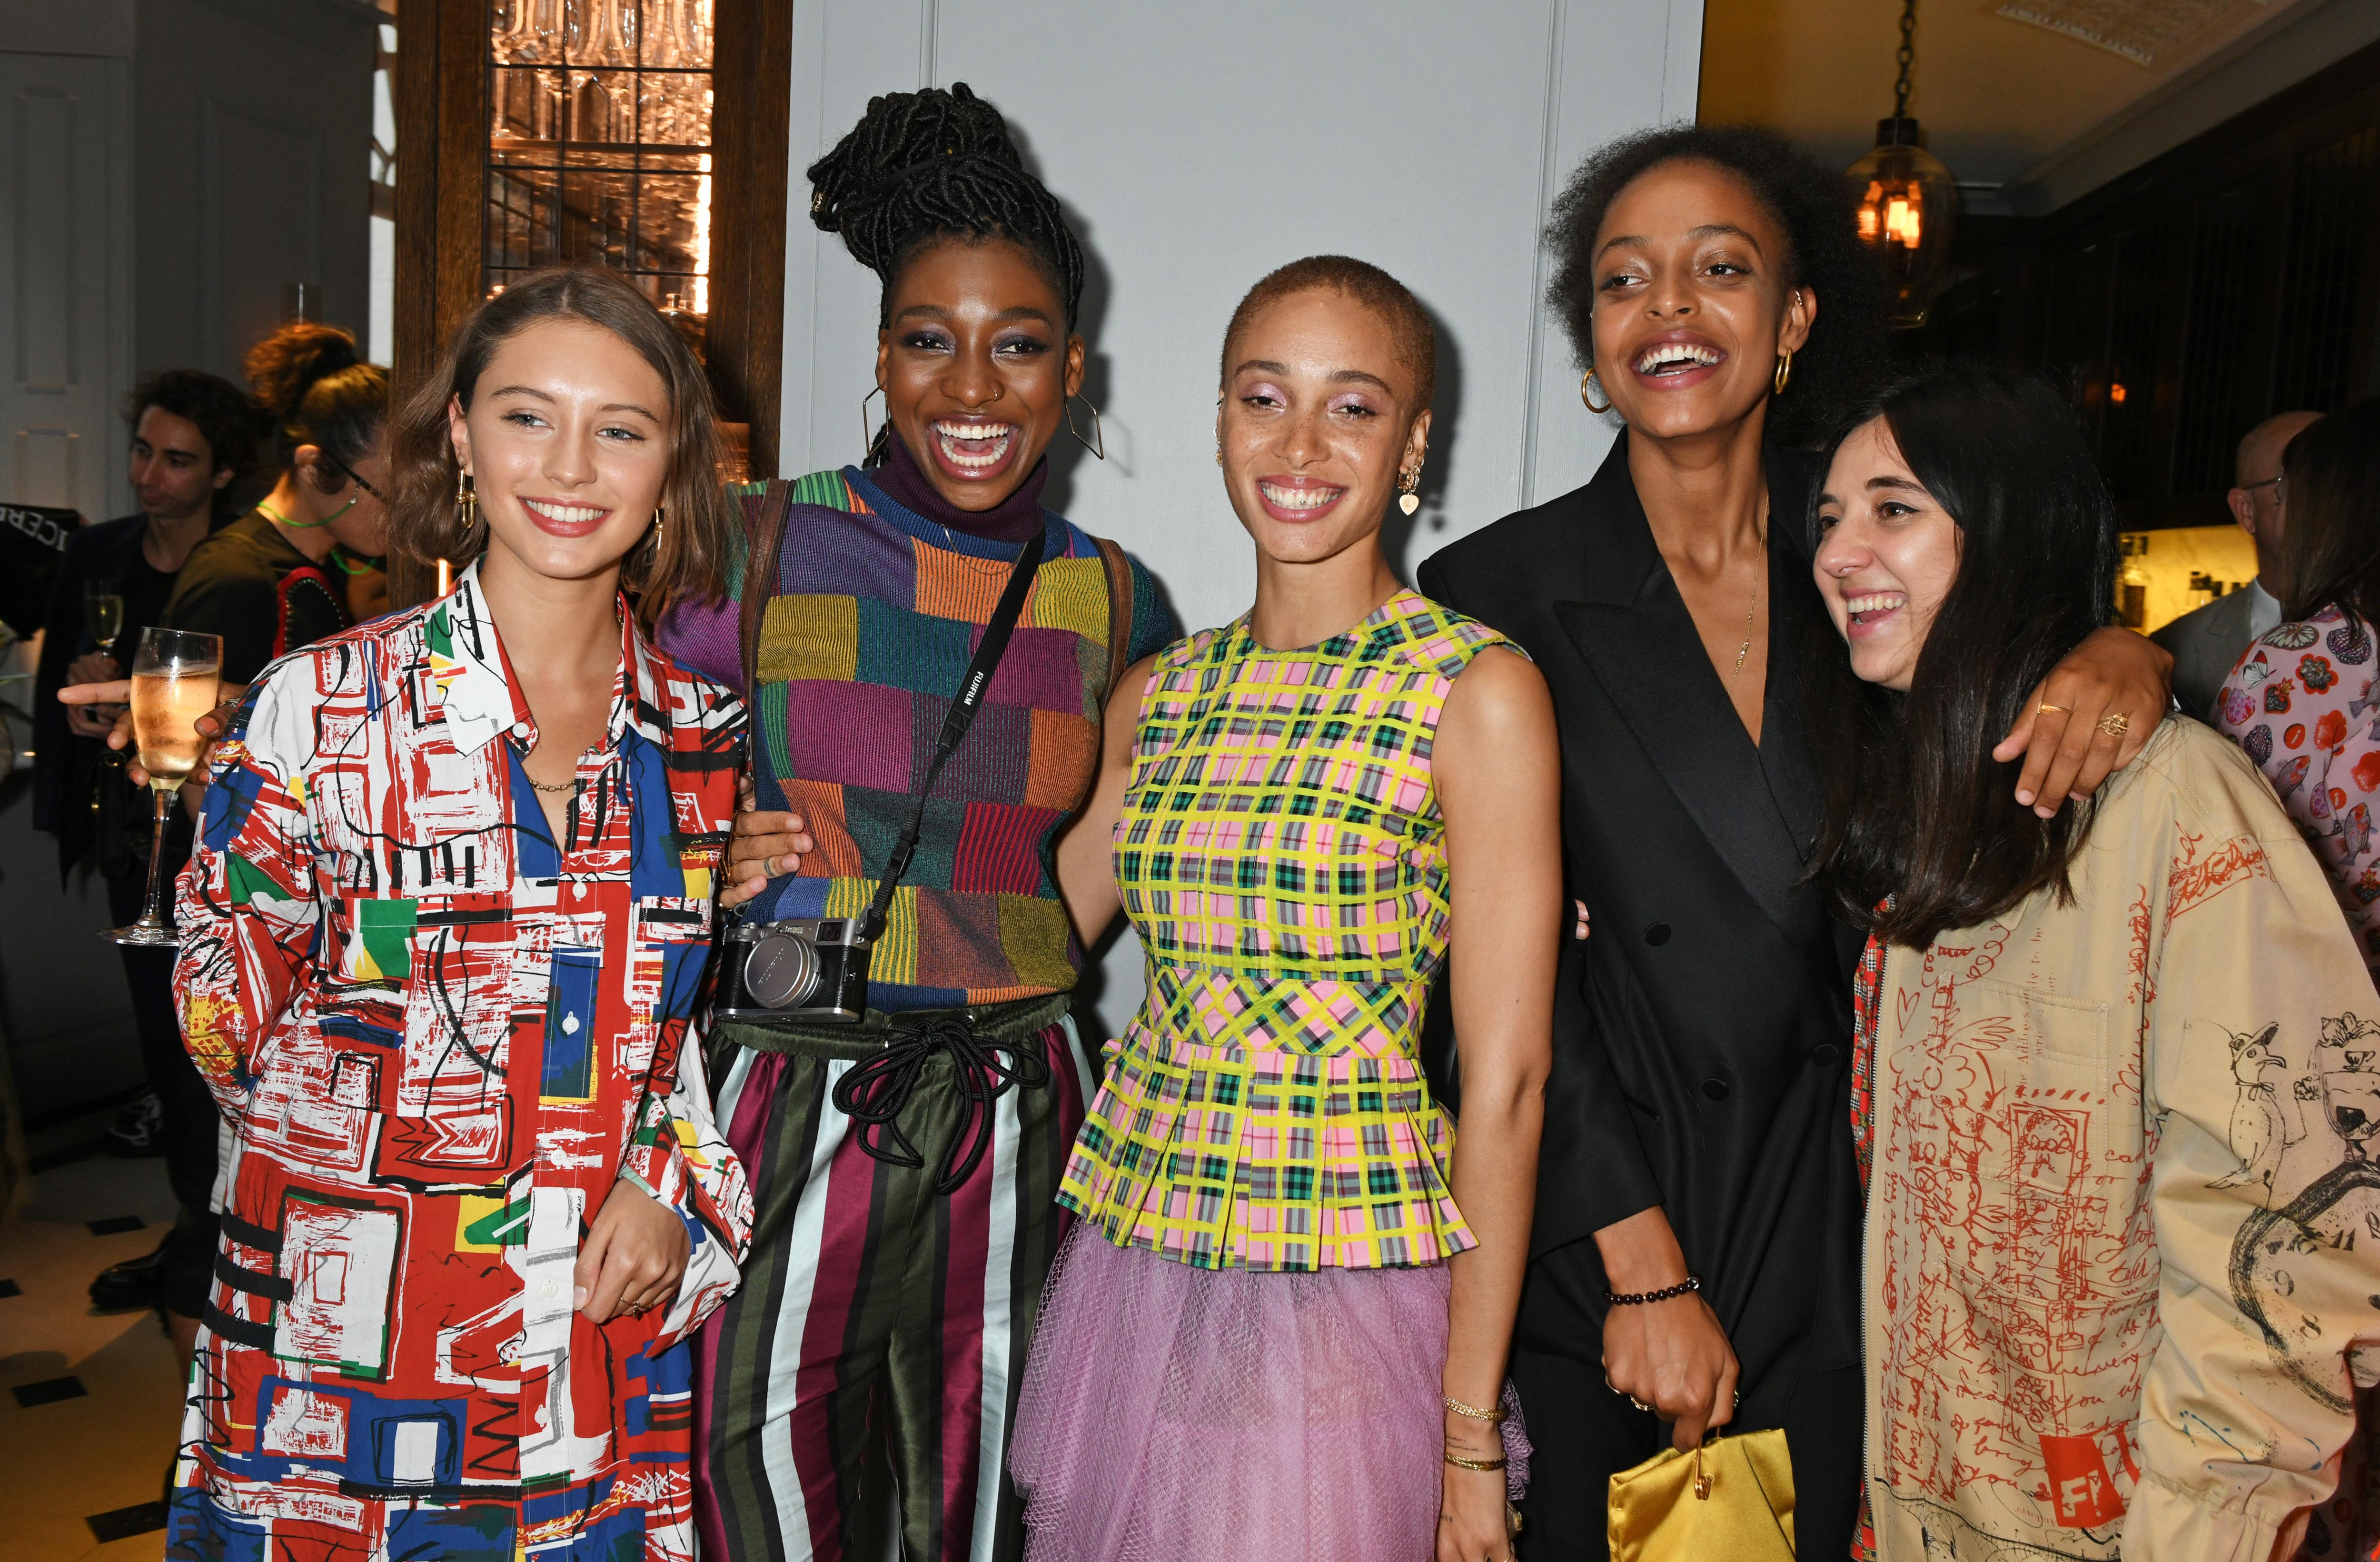 Iris Law, Lil Simz, Adwoa Aboah, Kesewa Aboah and Chloe Caillet